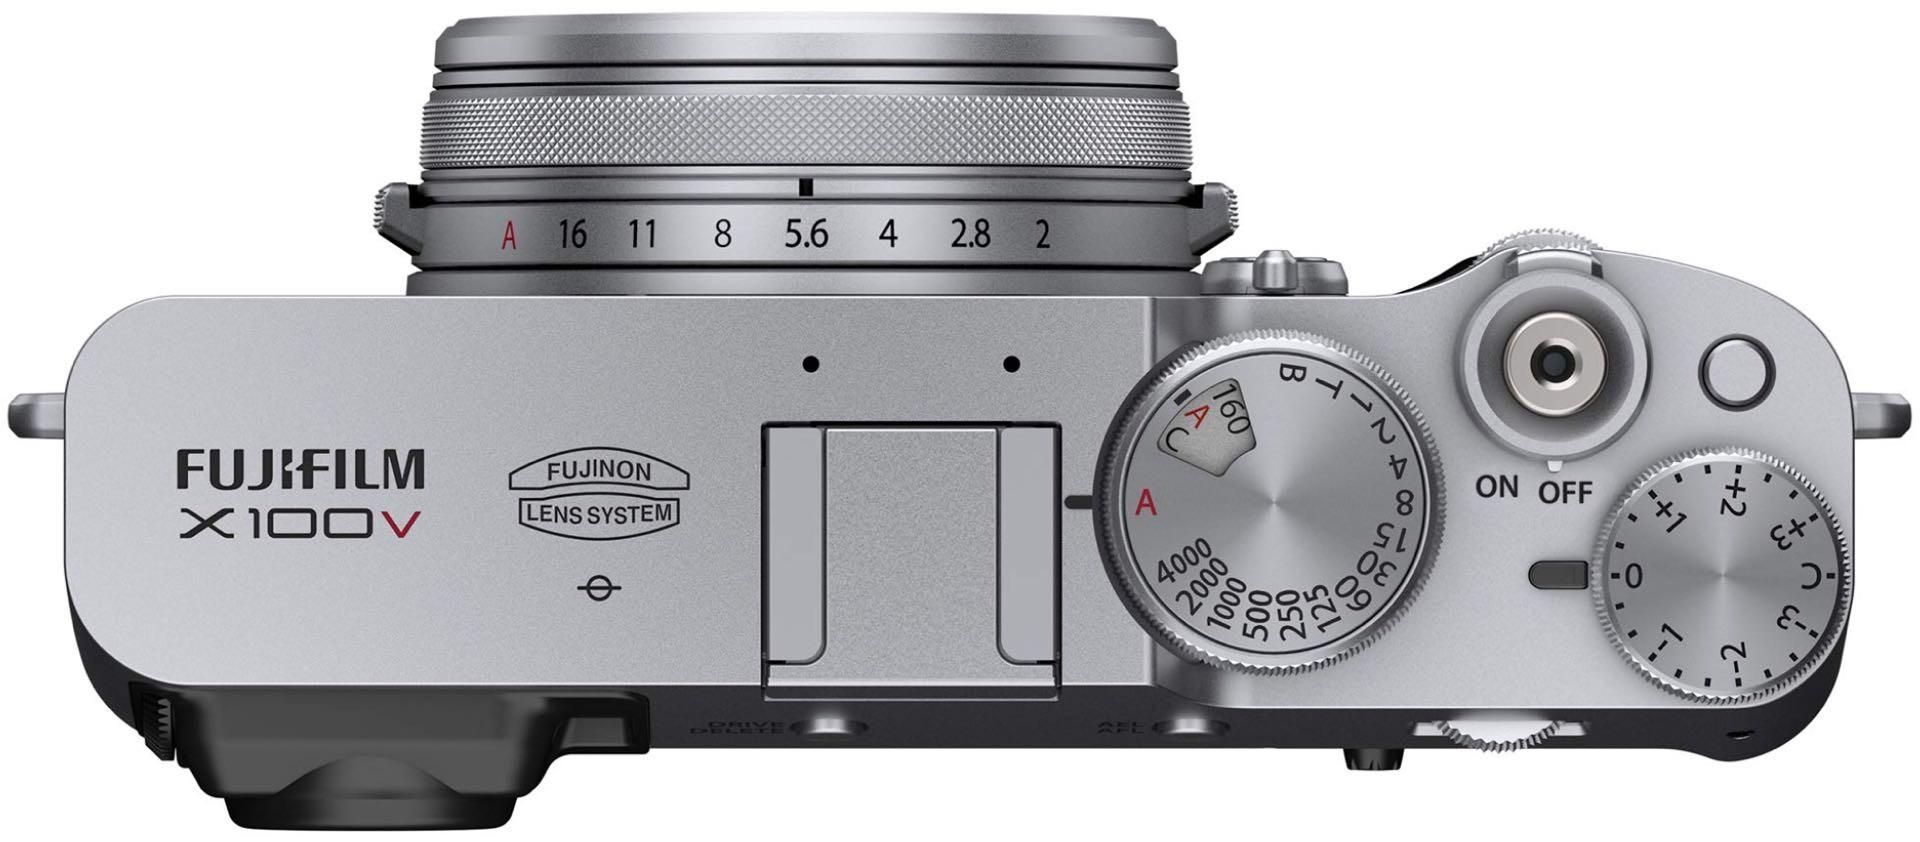 fujifilm-x100v-digital-camera-top